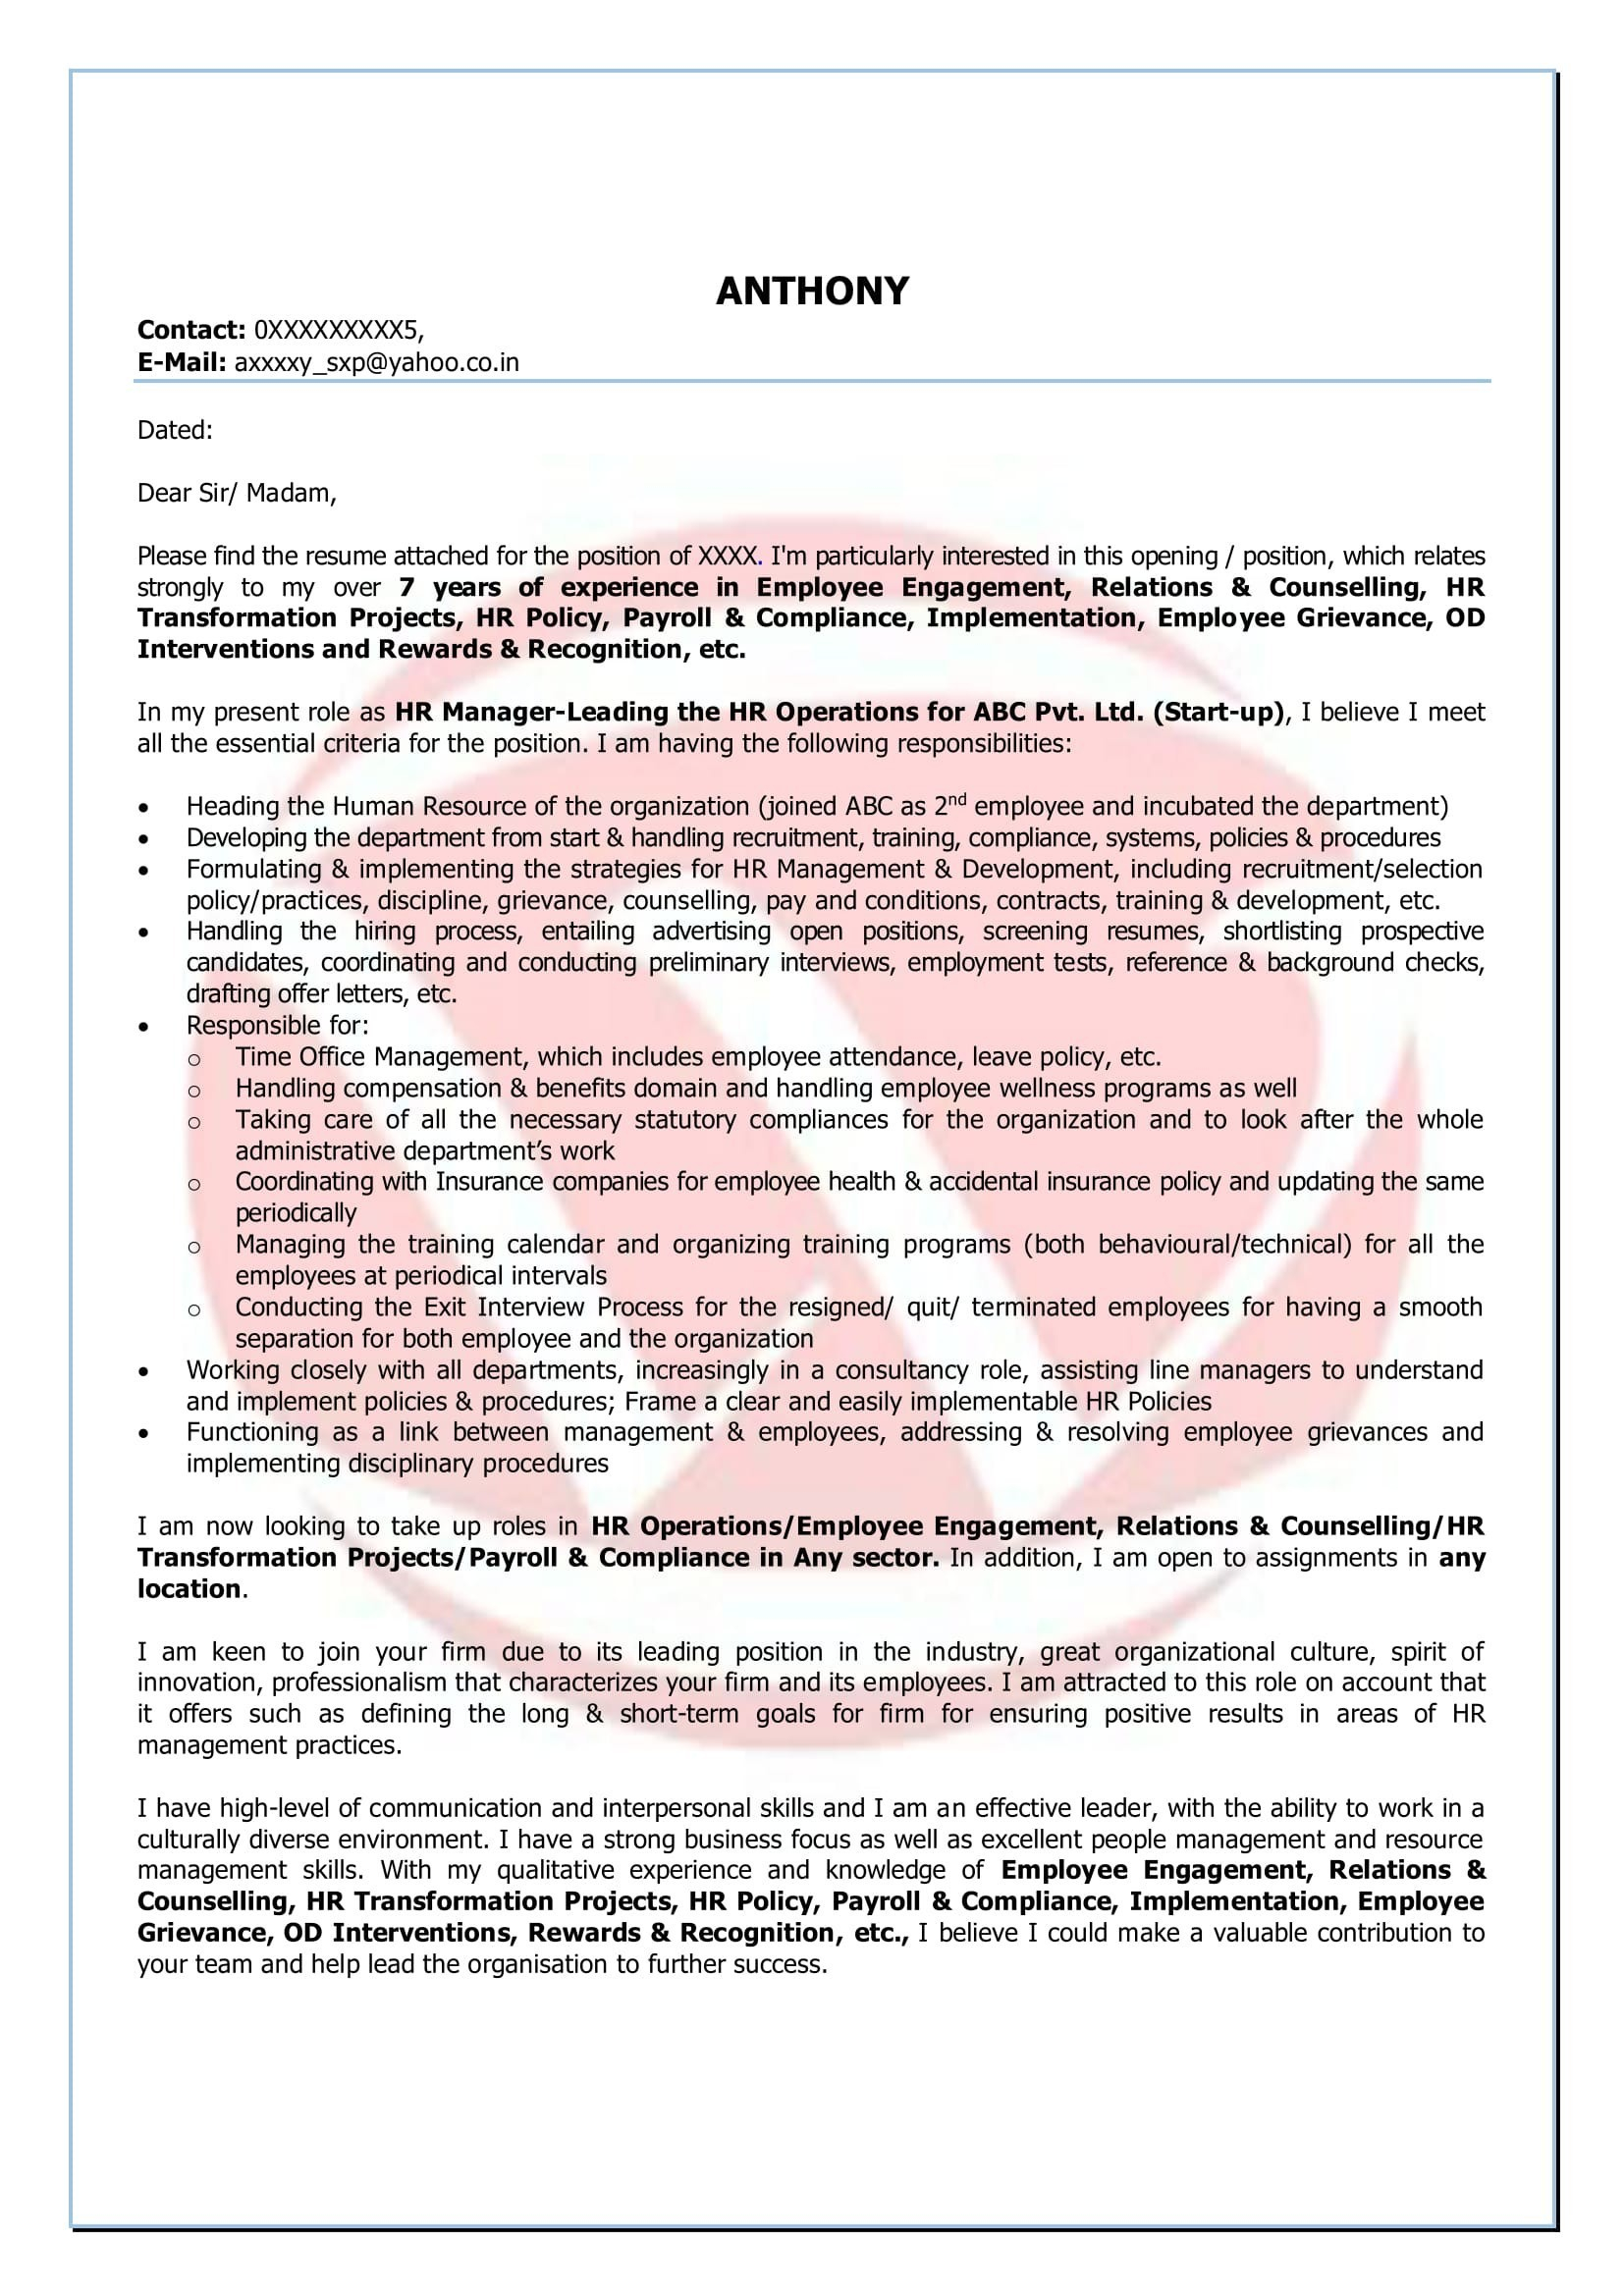 Employment Job Offer Letter Template - formal Job Fer Letter New Sample for Job Fer Letter New It Job Fer